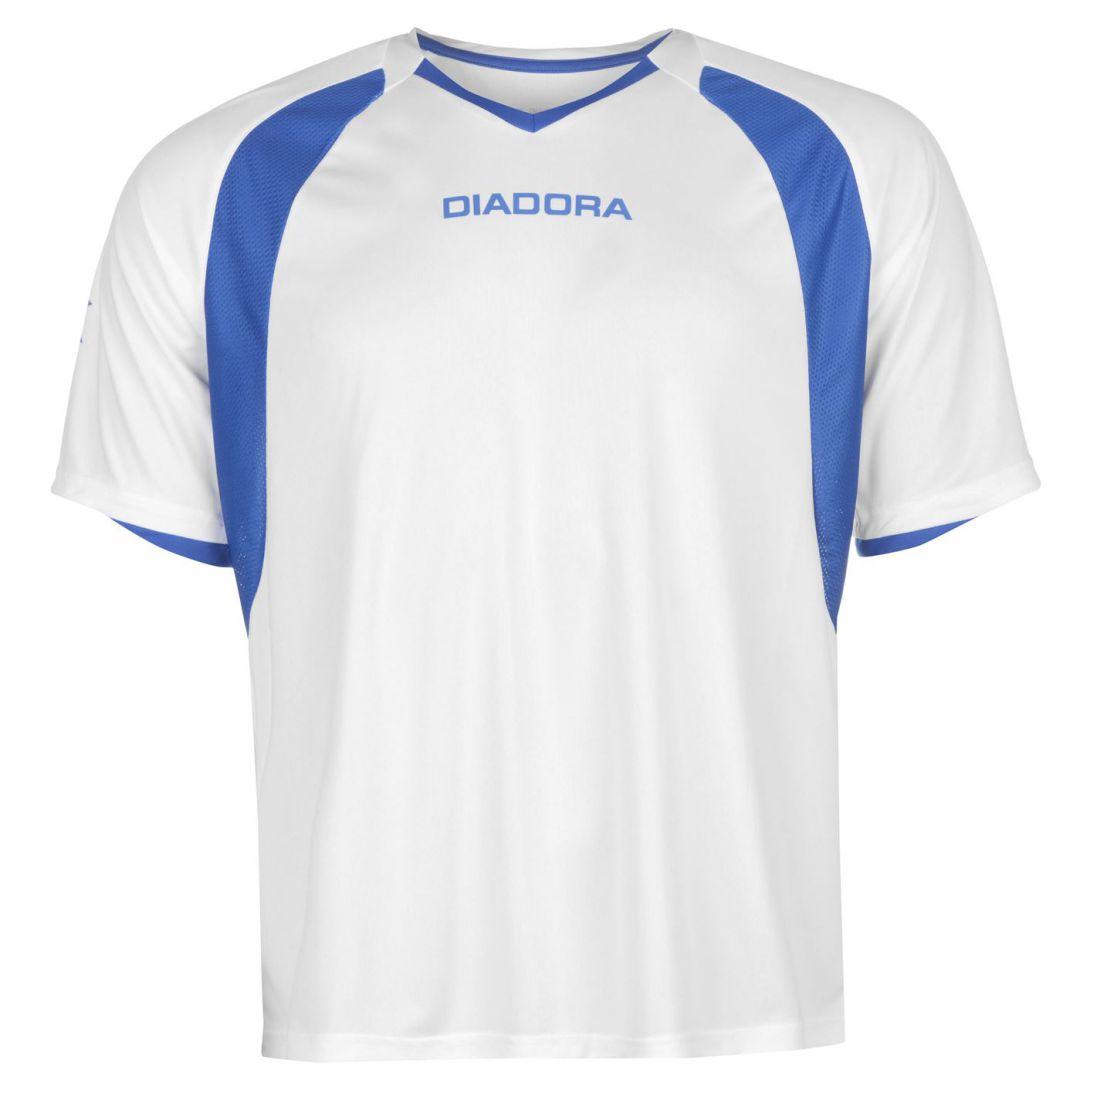 ca66d11498de95 Diadora Mens Brasilia T Shirt Baselayer Top Tee Compression Armor ...